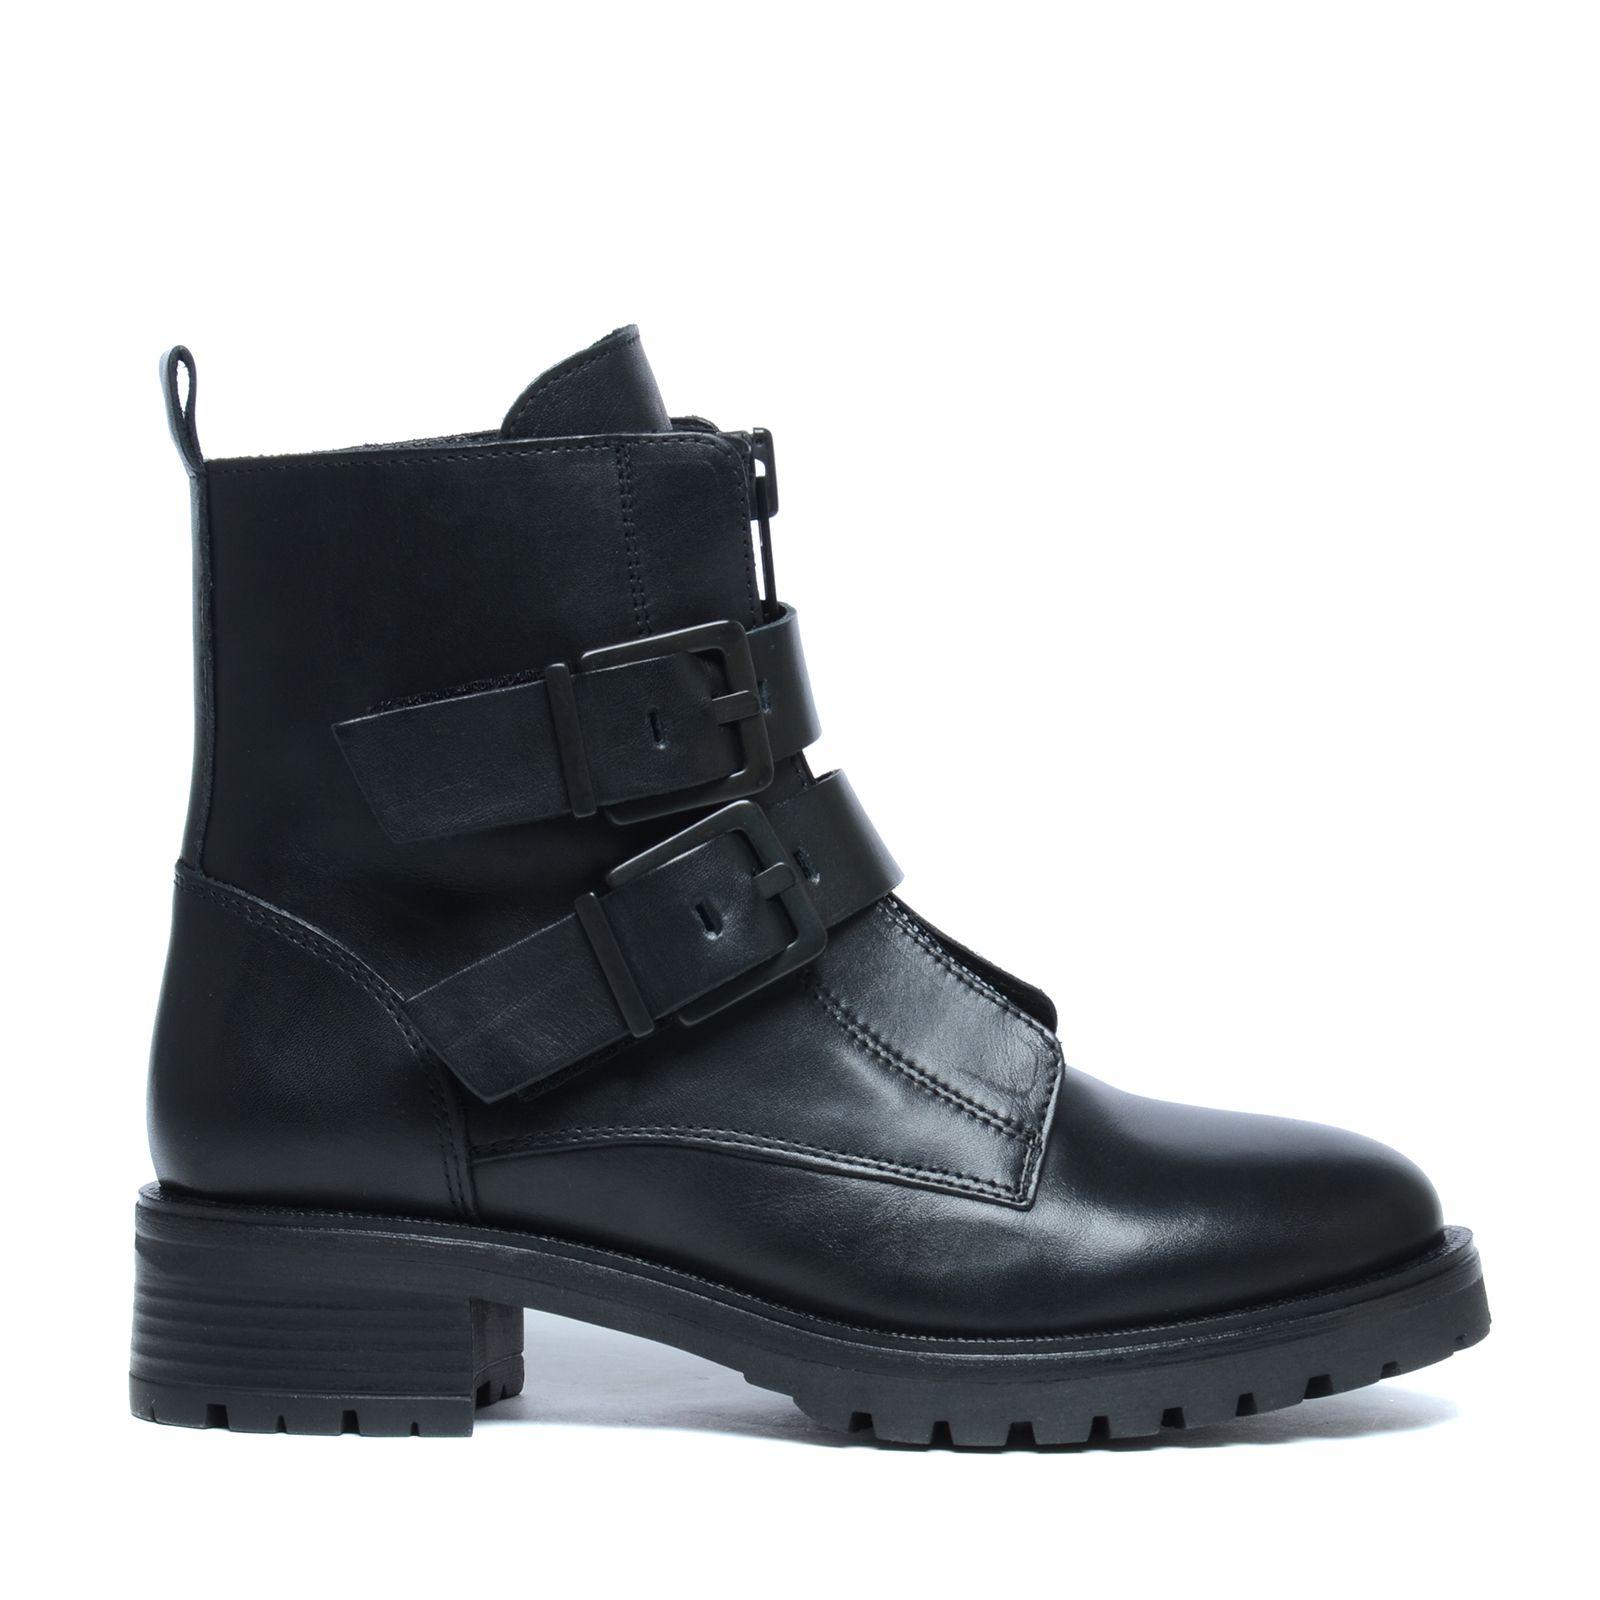 Shoppen Dames Schoenen Collectie Nieuwe Online Sacha qwwUa1Ex